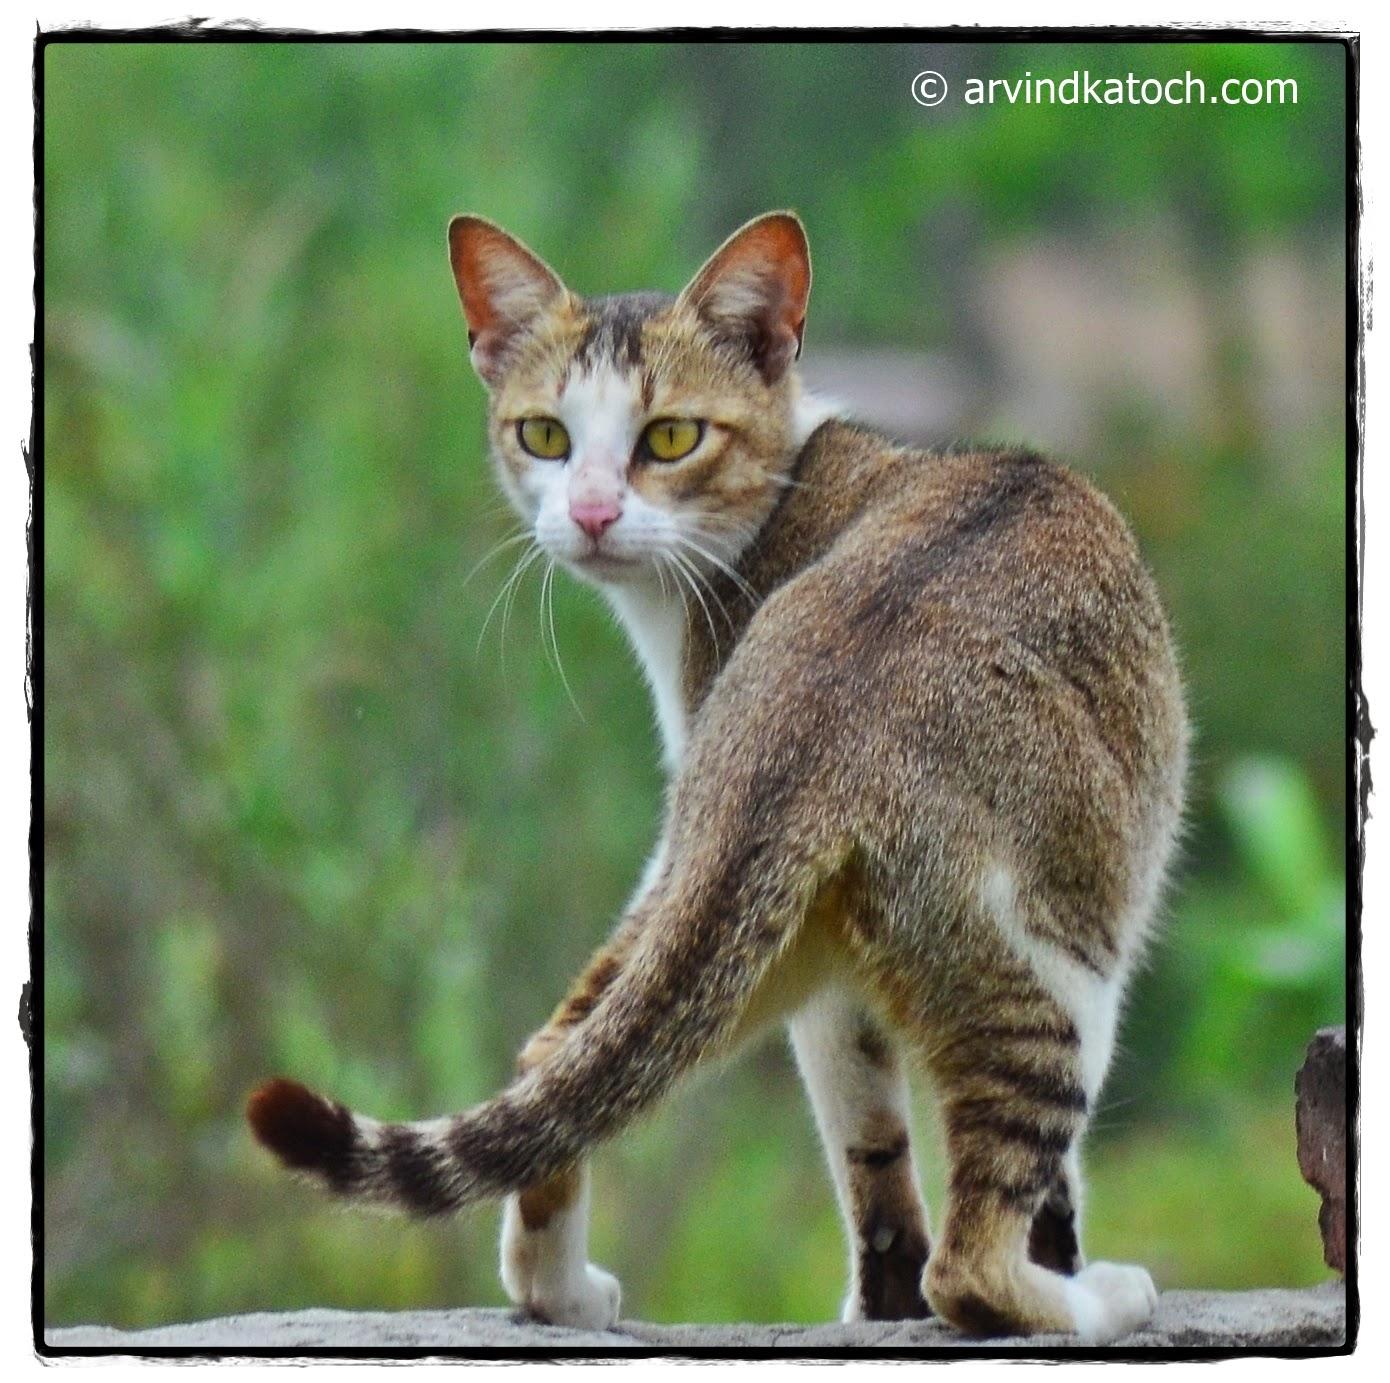 curious cat, cat, brown white cat